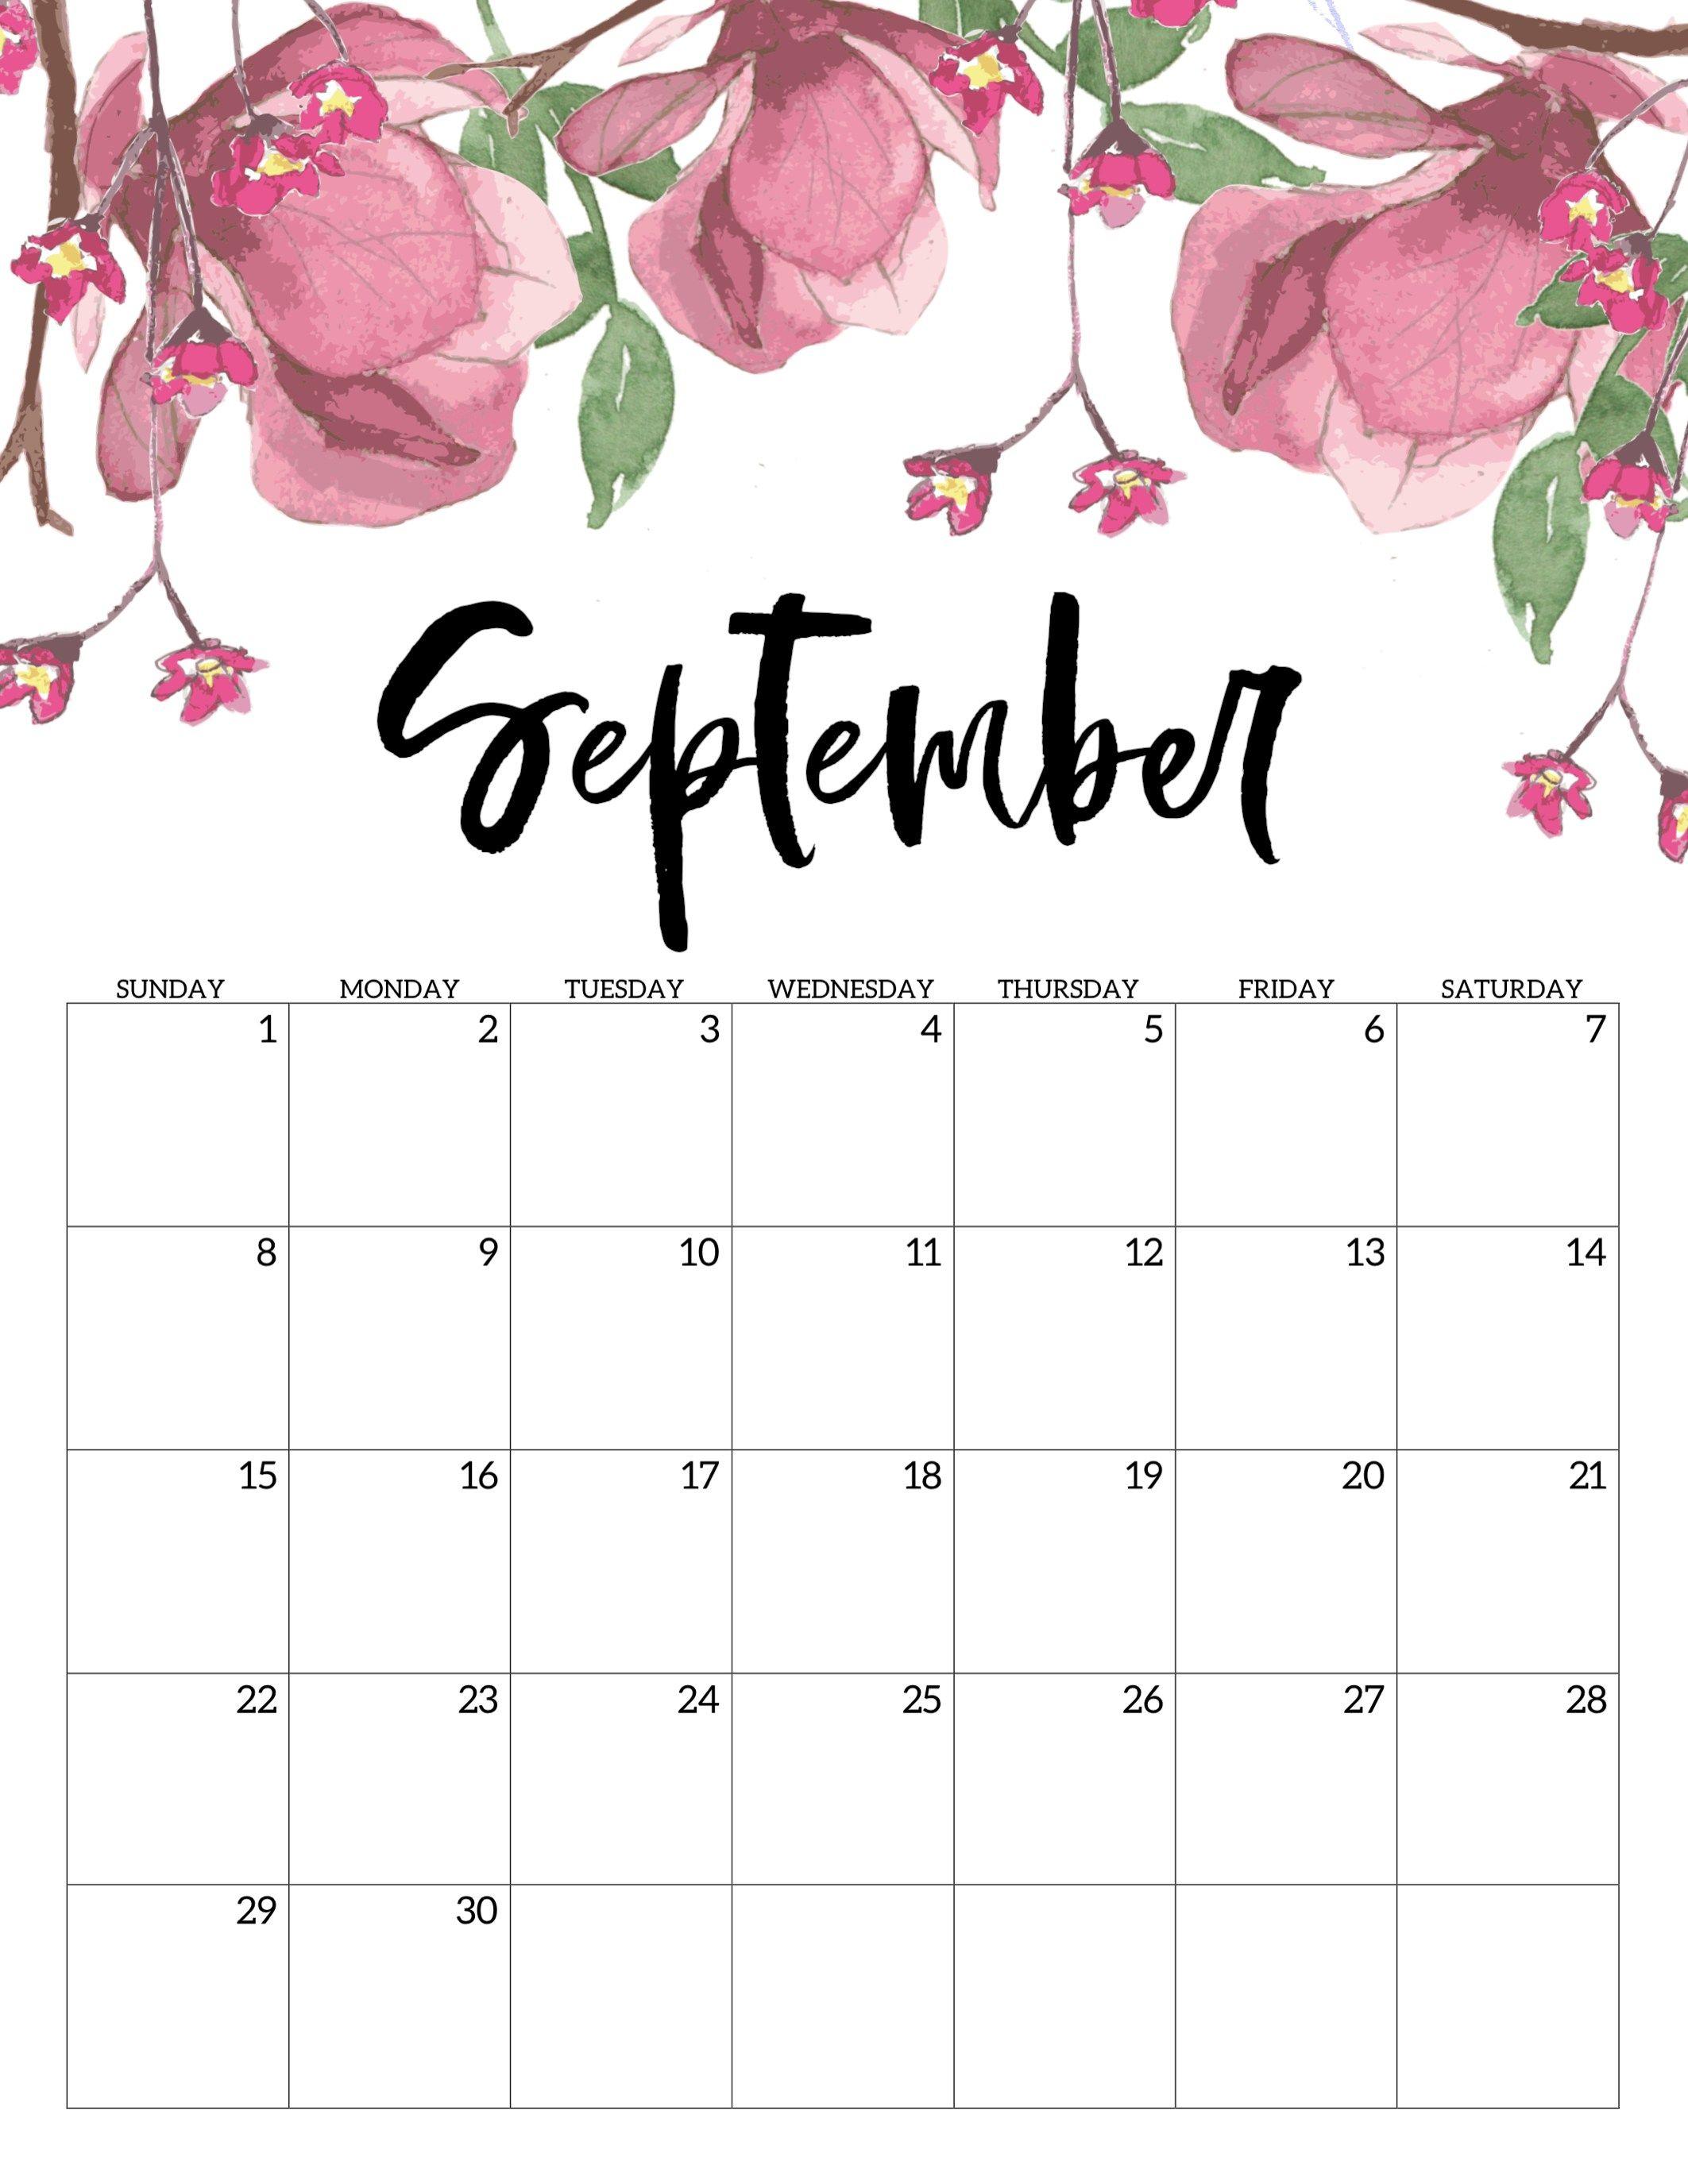 Free Printable Calendar 2019 - Floral | Еженедельный